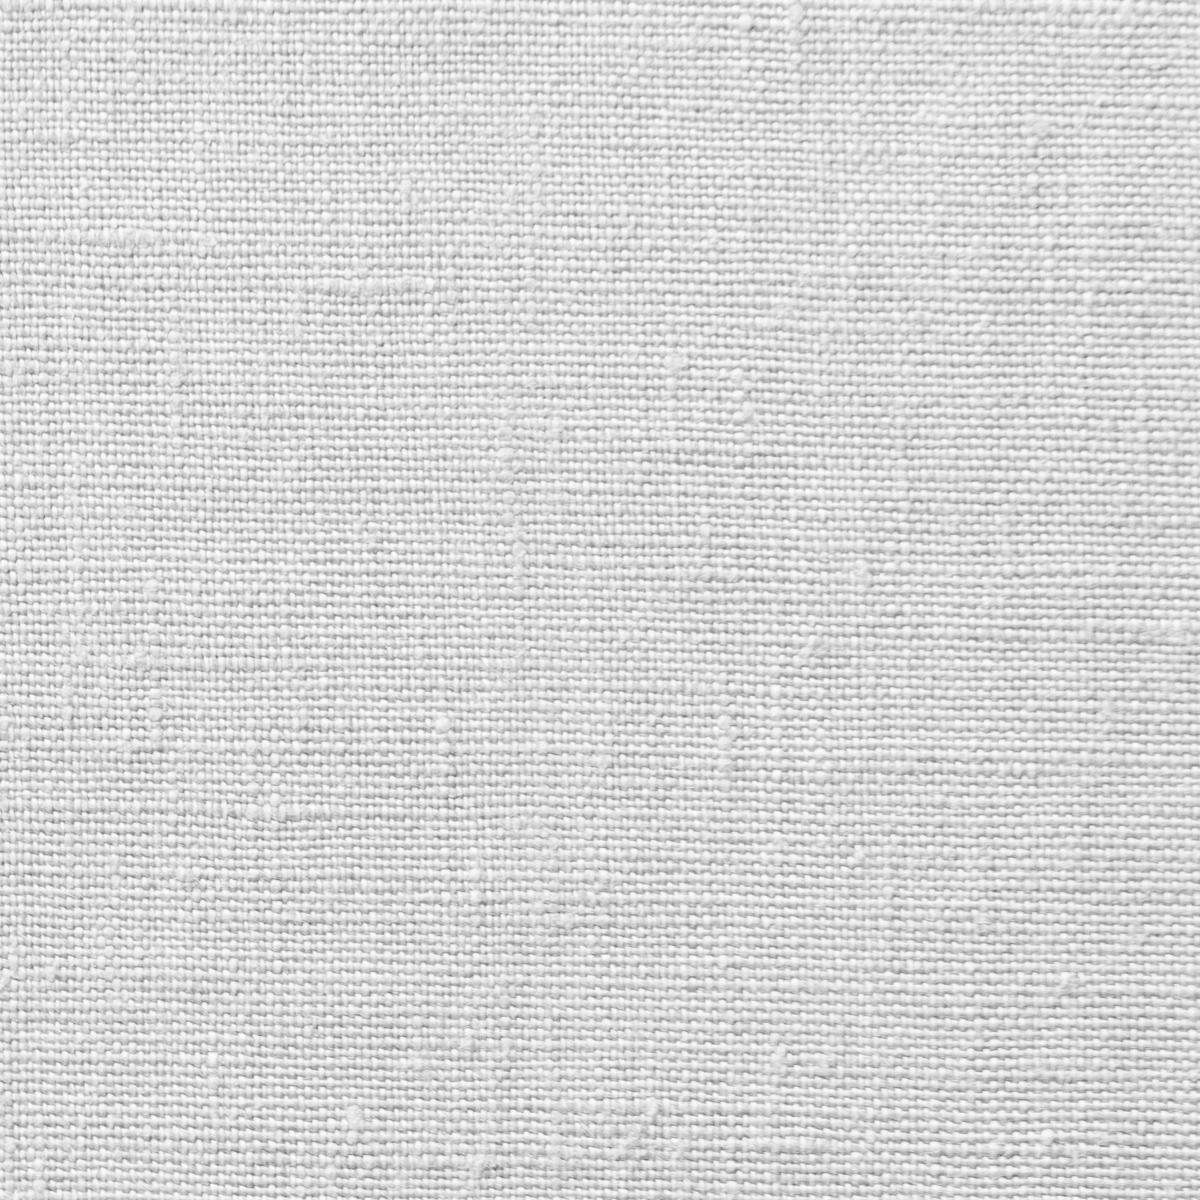 Wedding album fabric swatch sample, frost